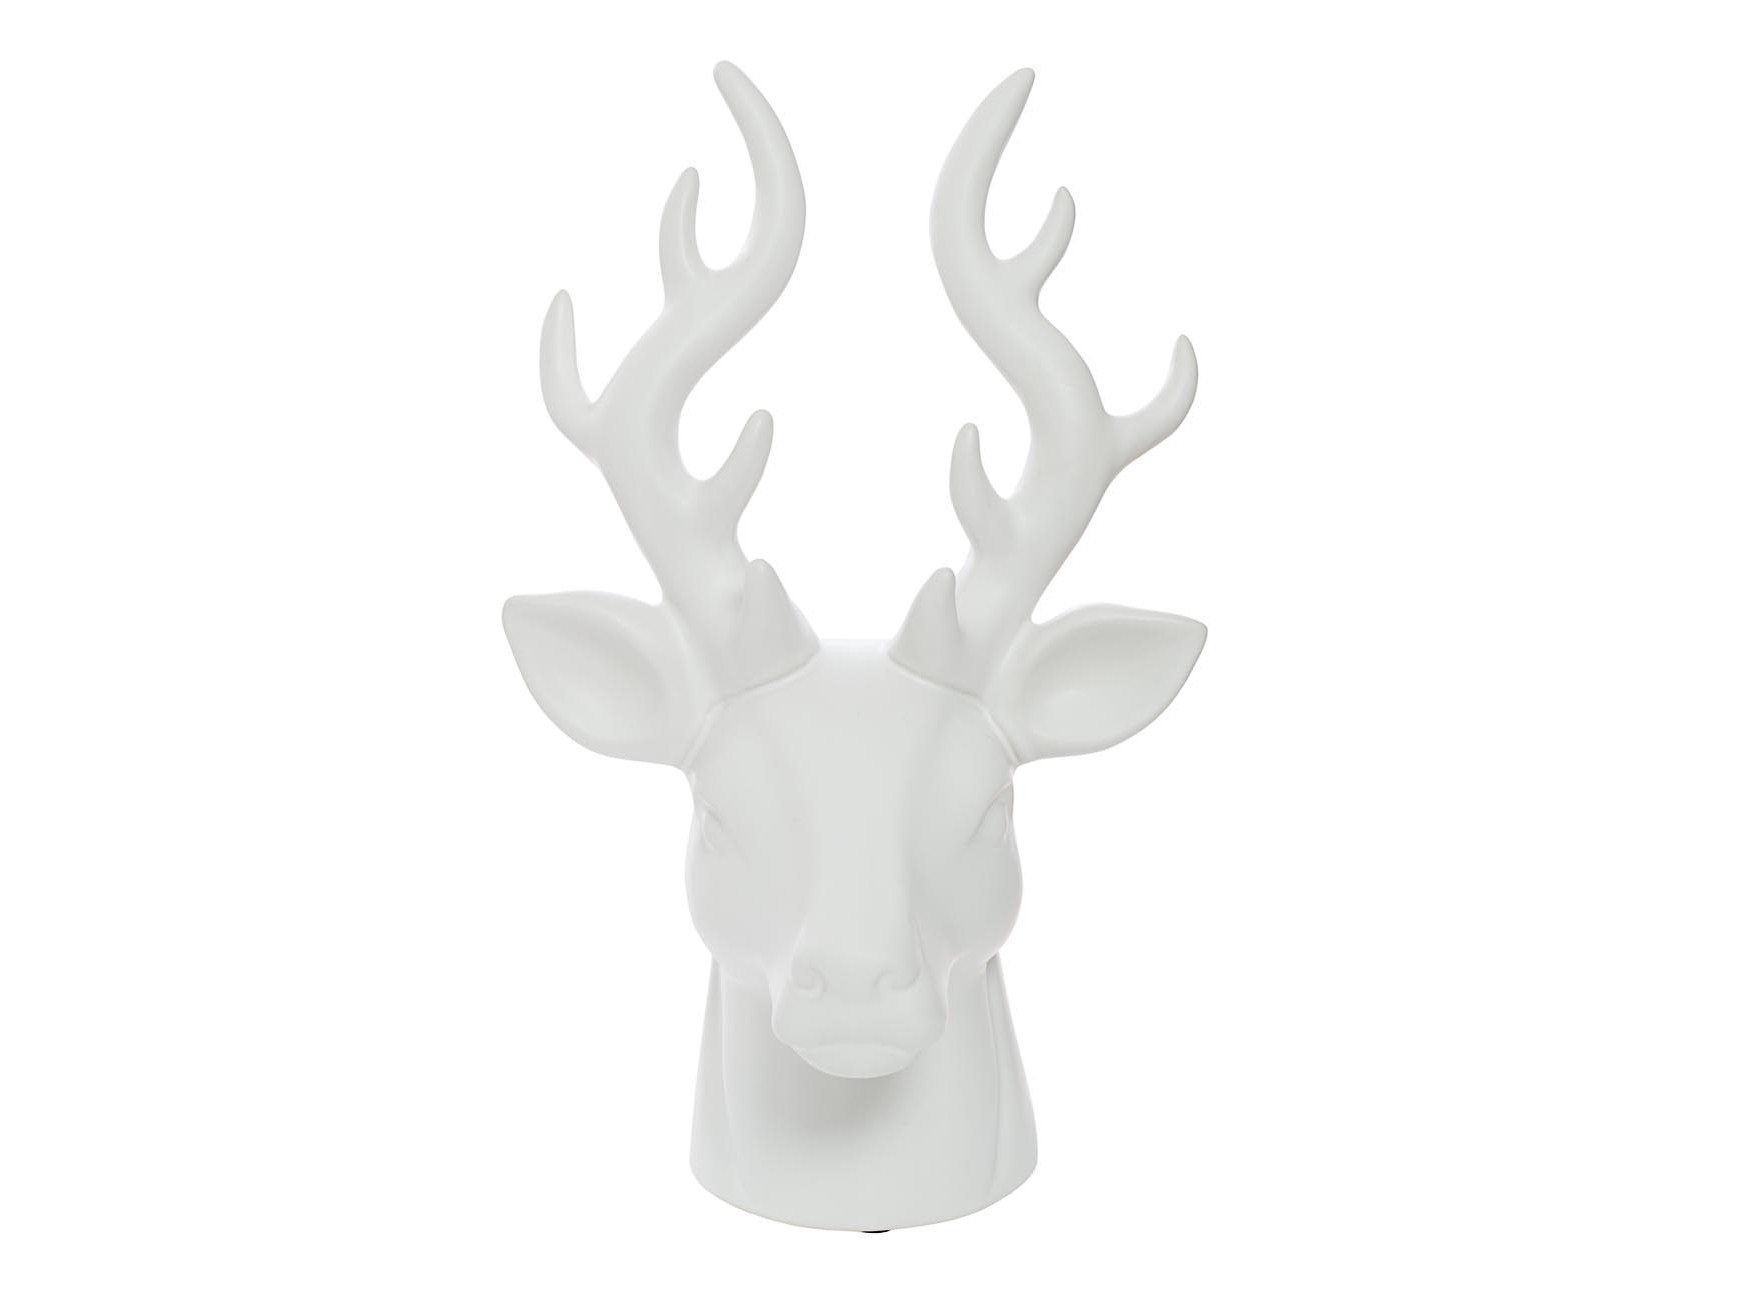 Статуэтка Голова оленяСтатуэтки<br><br><br>Material: Керамика<br>Width см: 21<br>Depth см: 18<br>Height см: 35.4